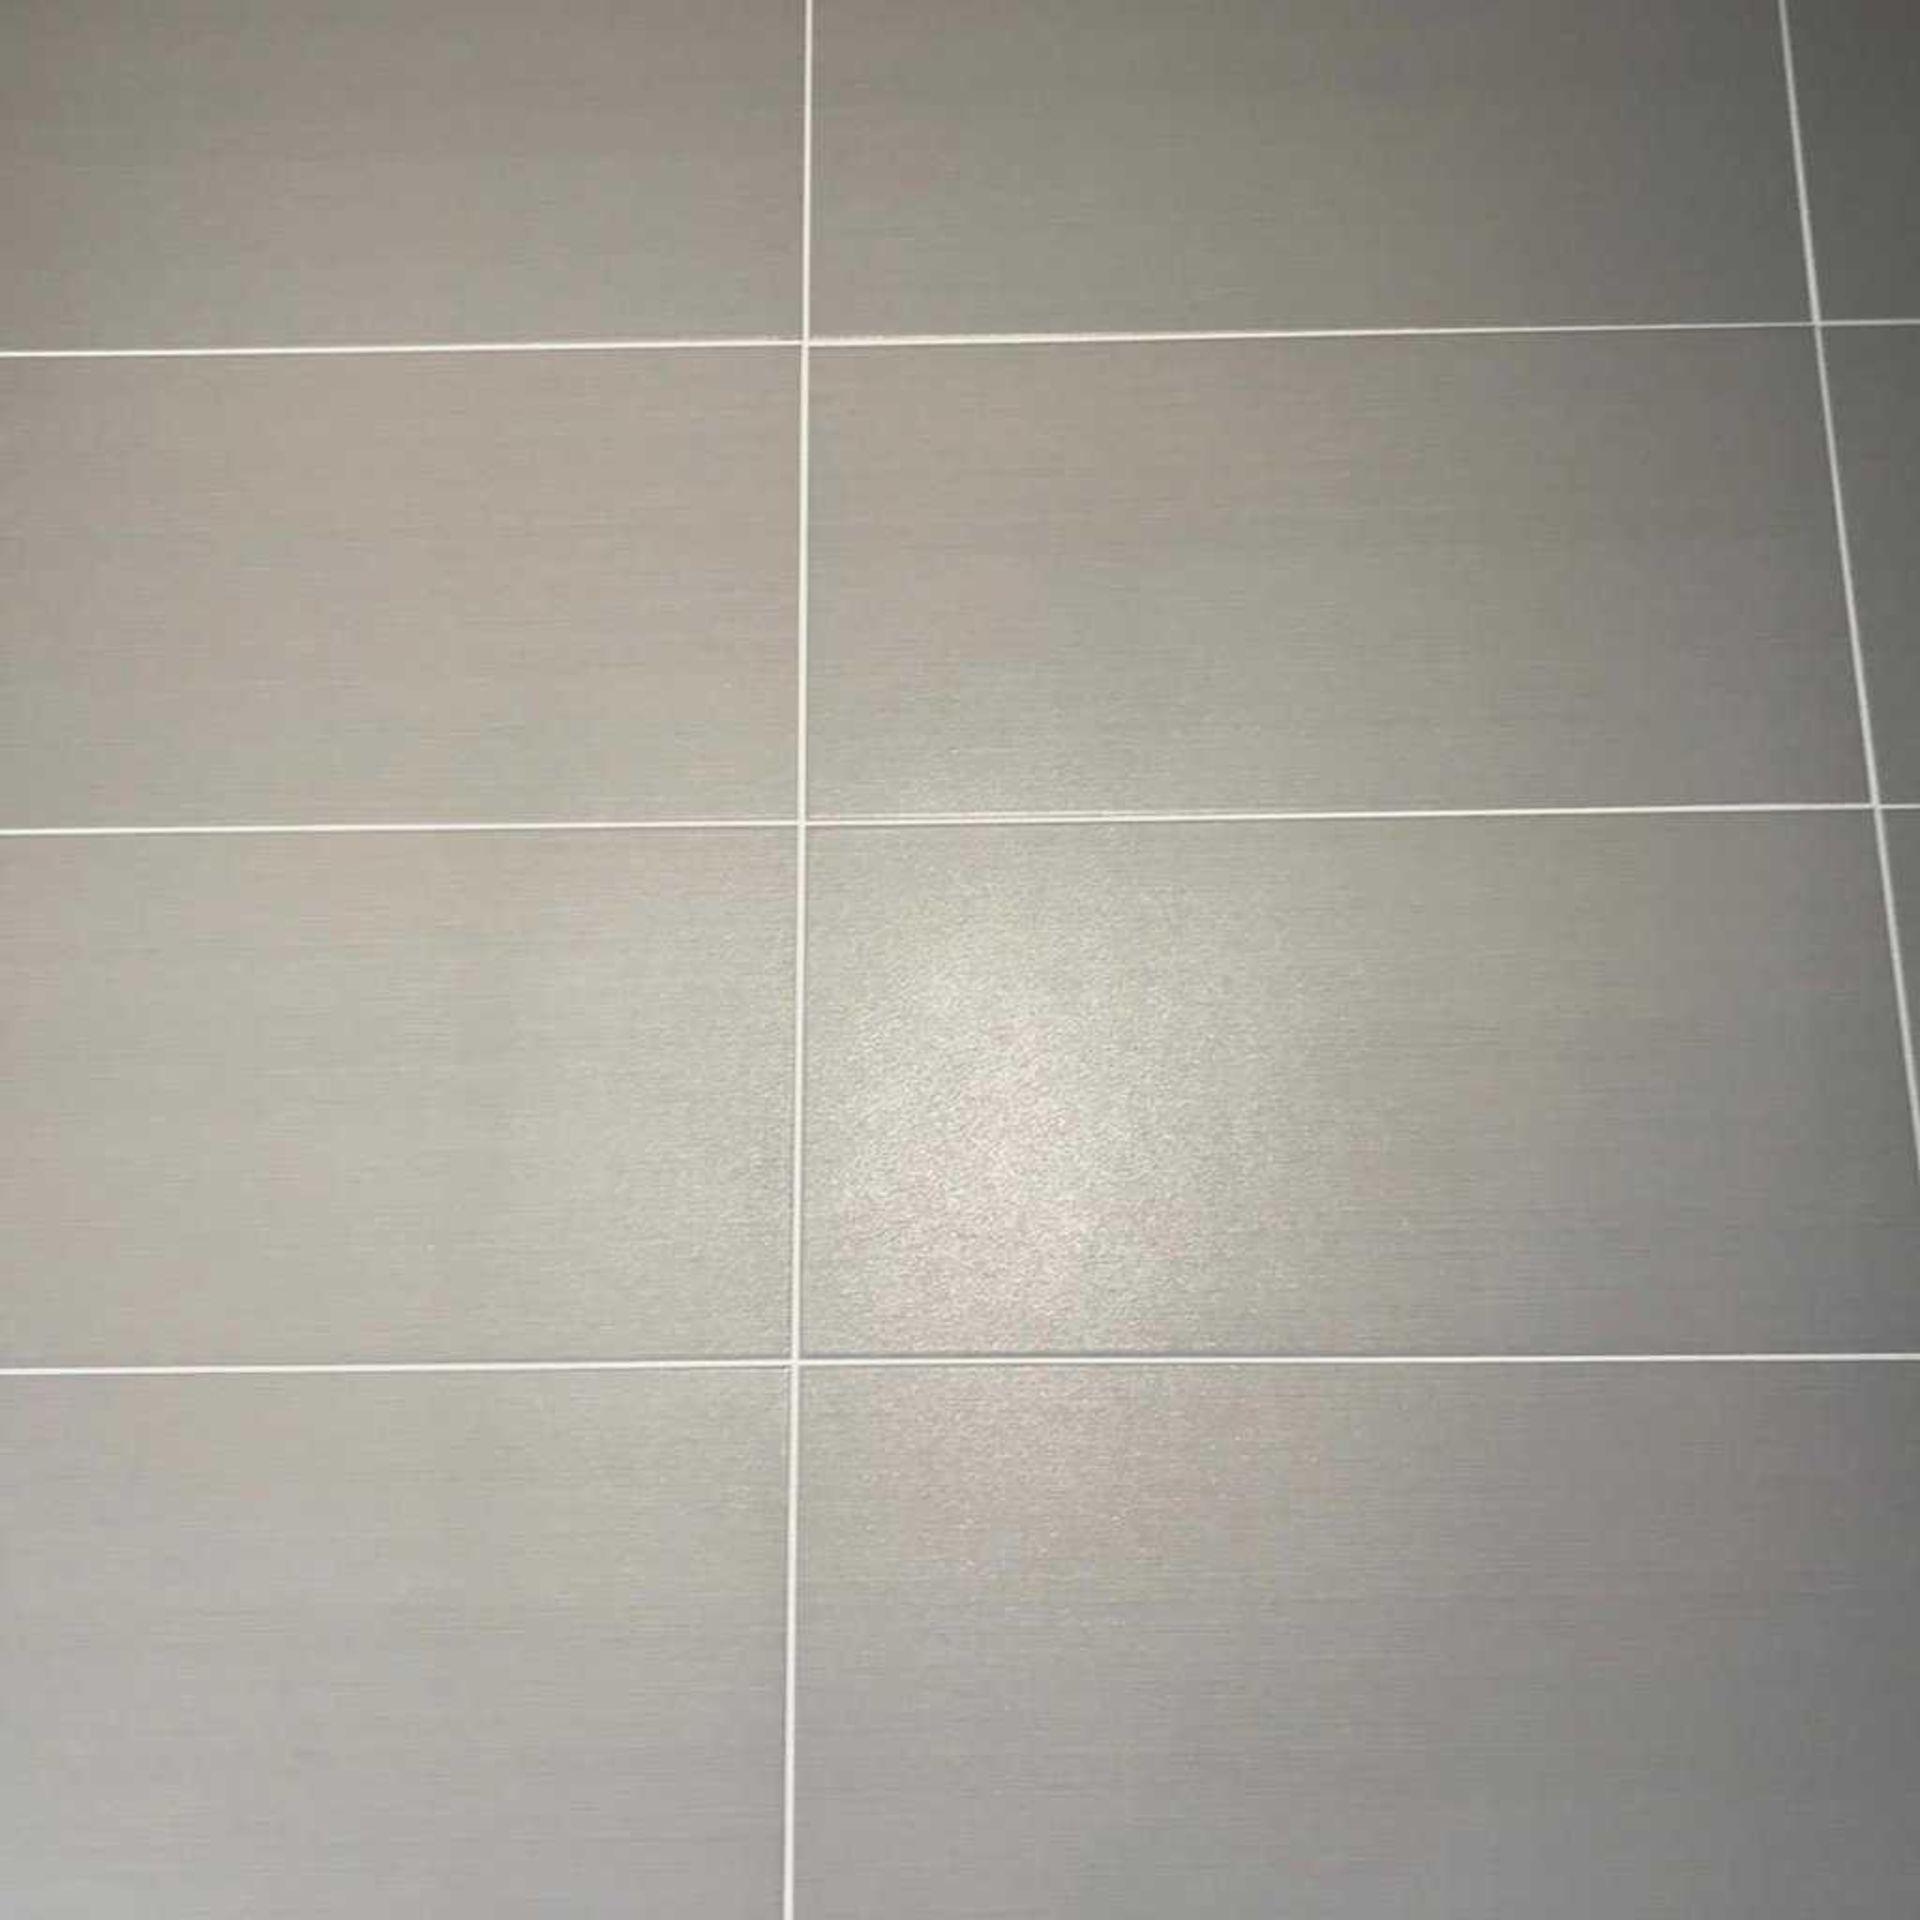 RRP £1000 Pallet To Contain 40 Packs Of 5 Johnson's Lat12A Latitude Smoke Satin Tiles